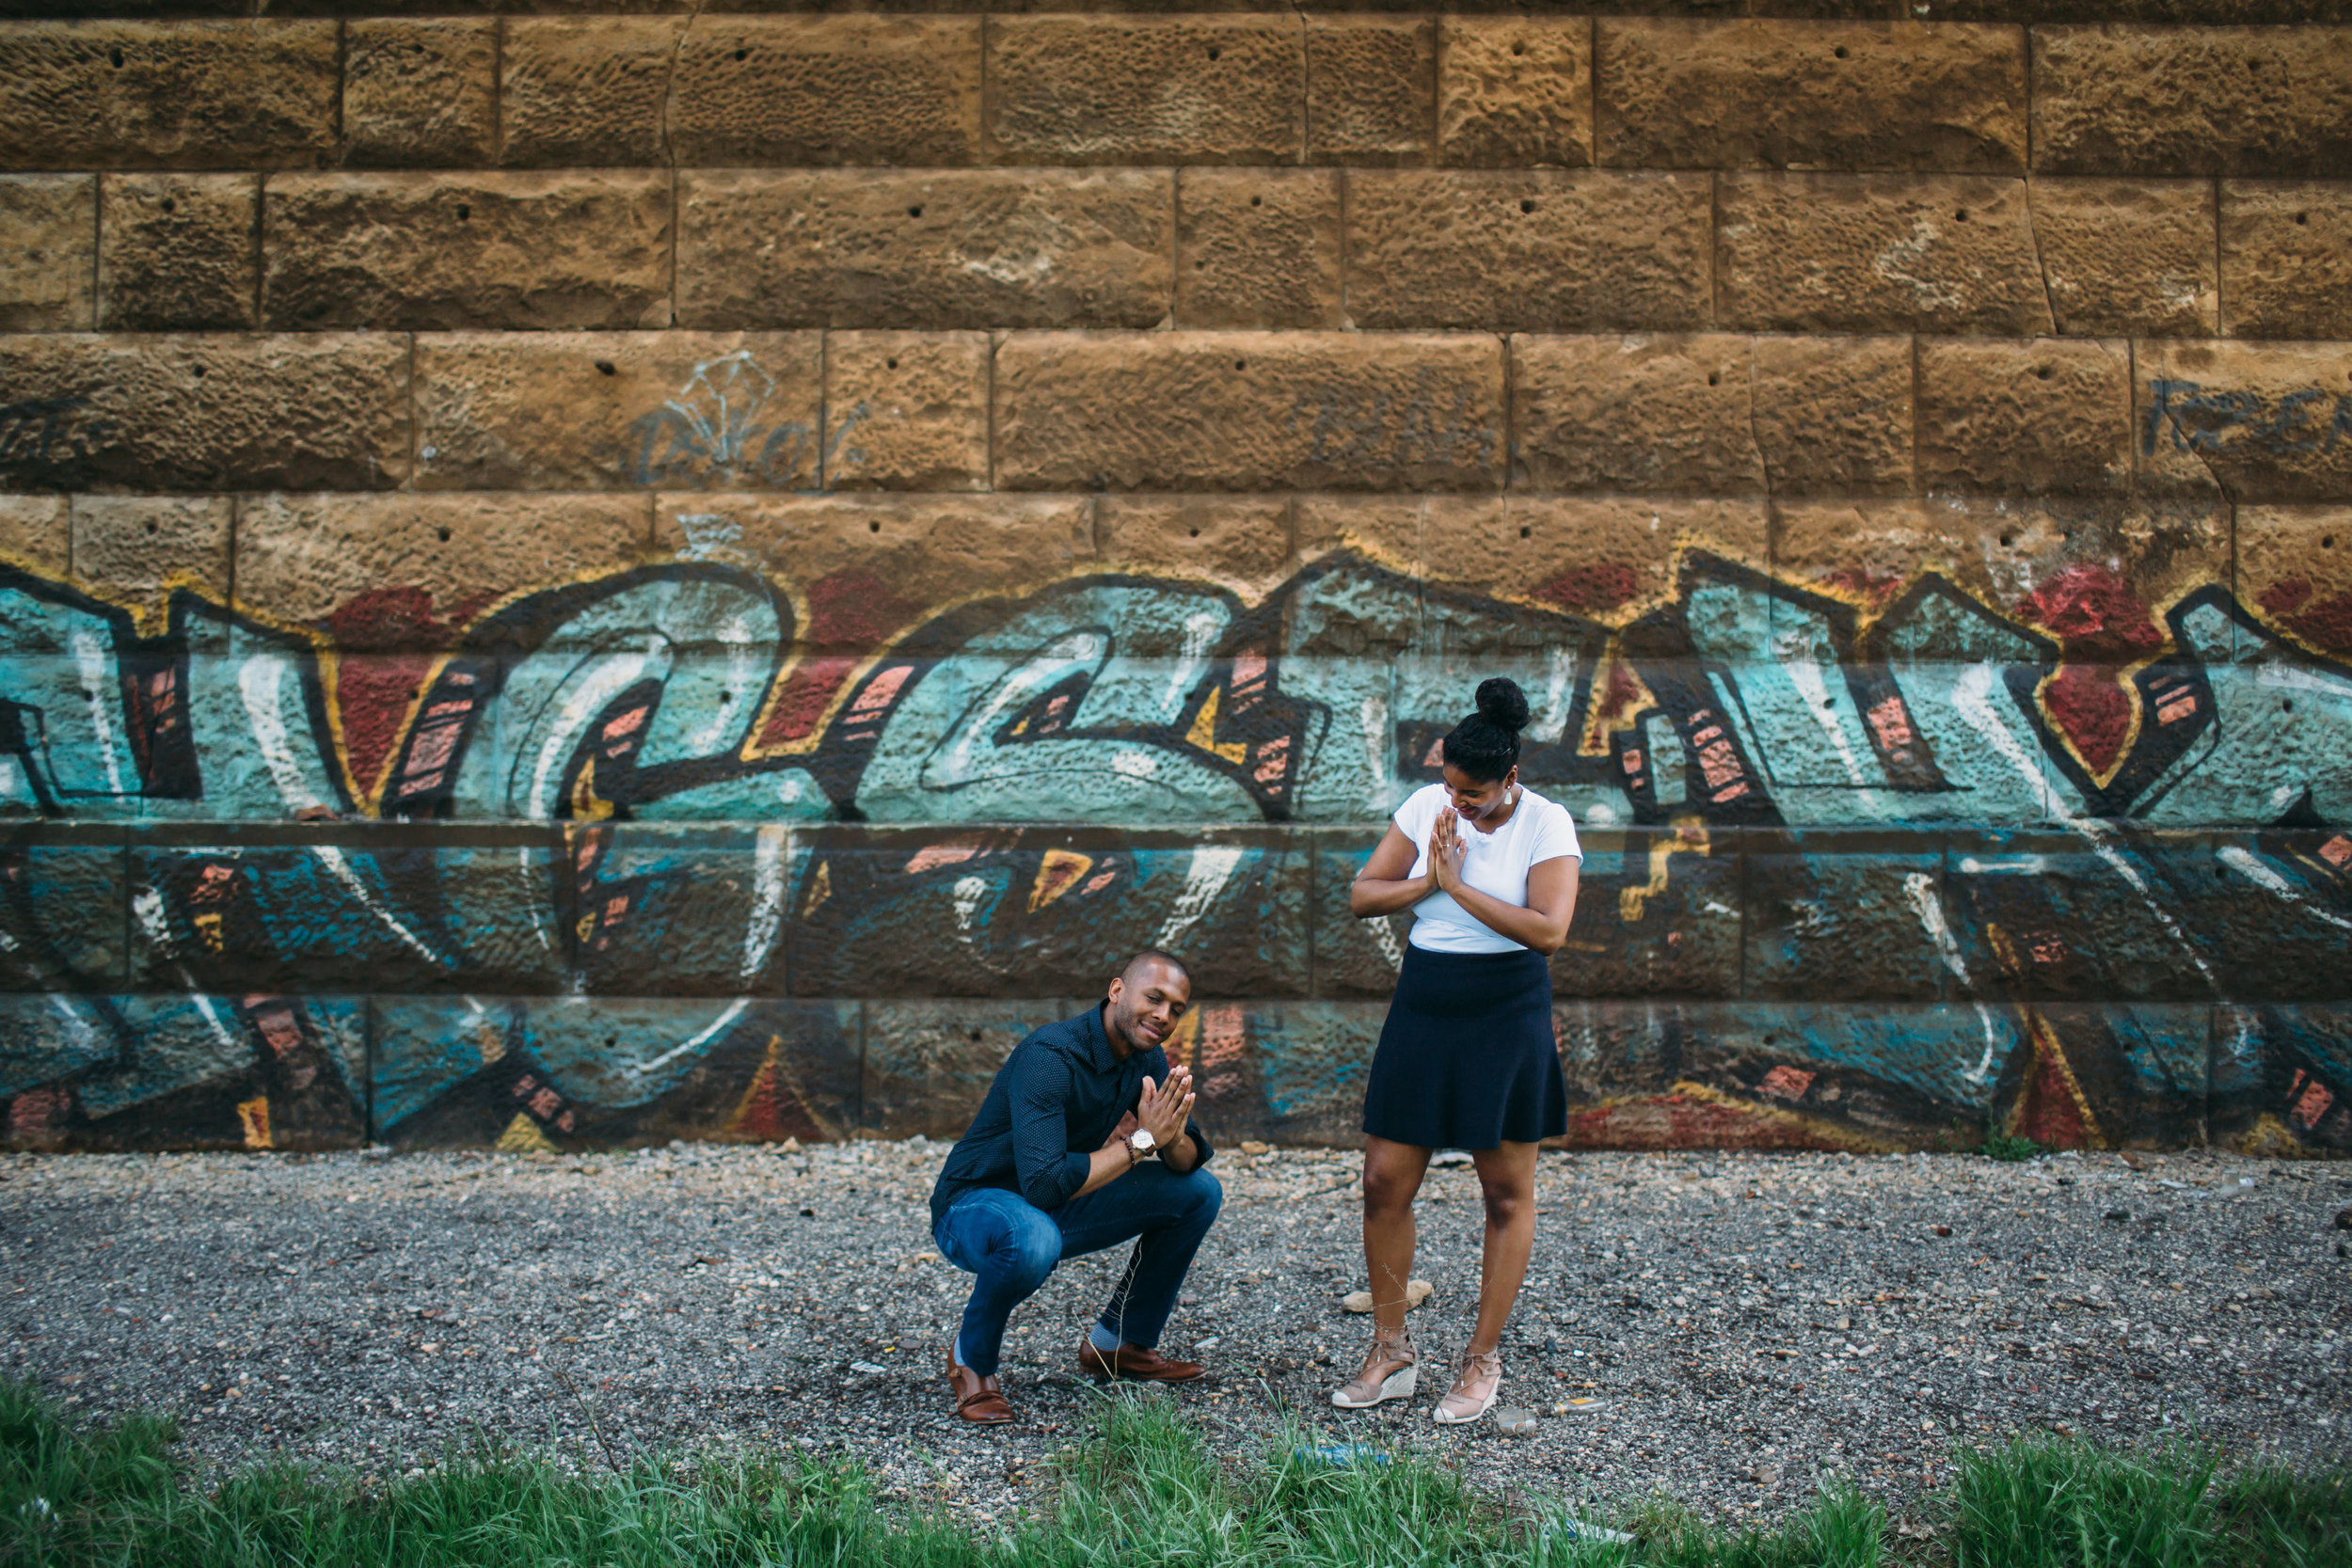 engagement photography denver, engagement photography chicago, engagement photography los angeles, engagement photography STL, engagement photos denver